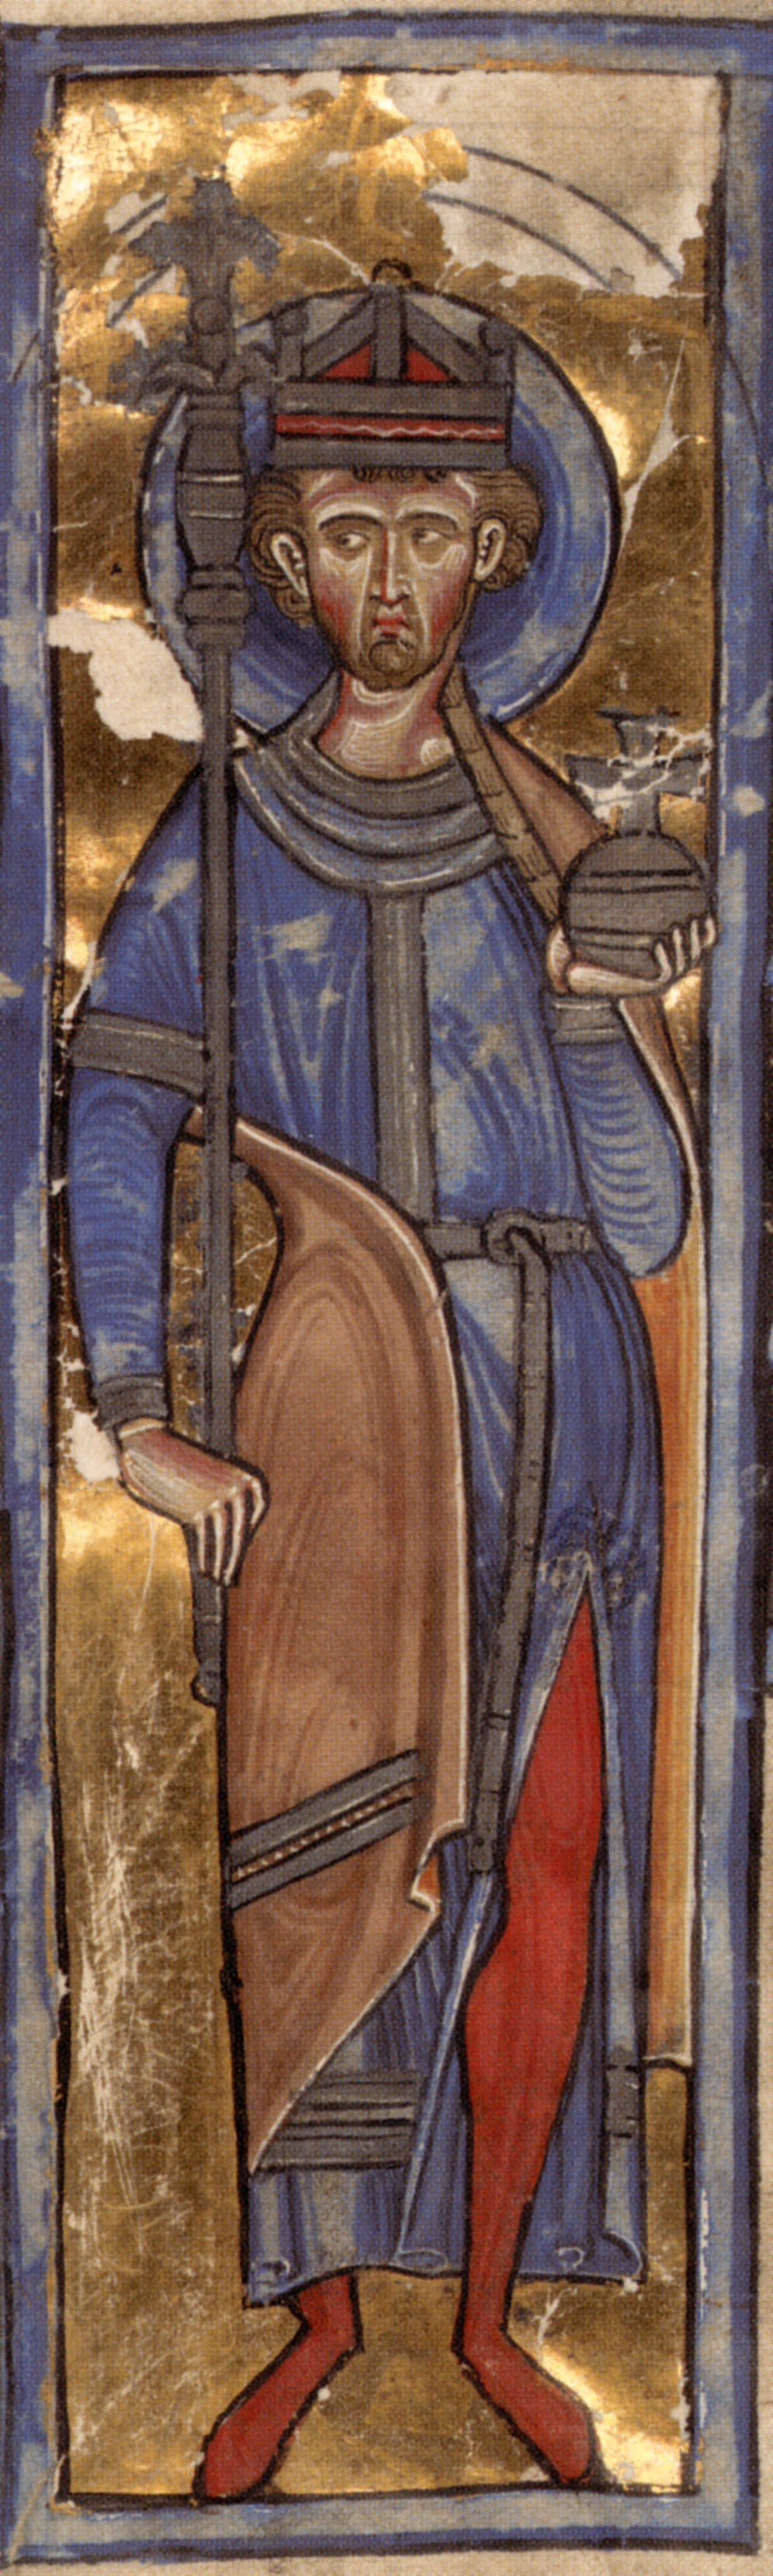 König Oswald, Manuskript Spencer 1, um 1220, New York Public Library